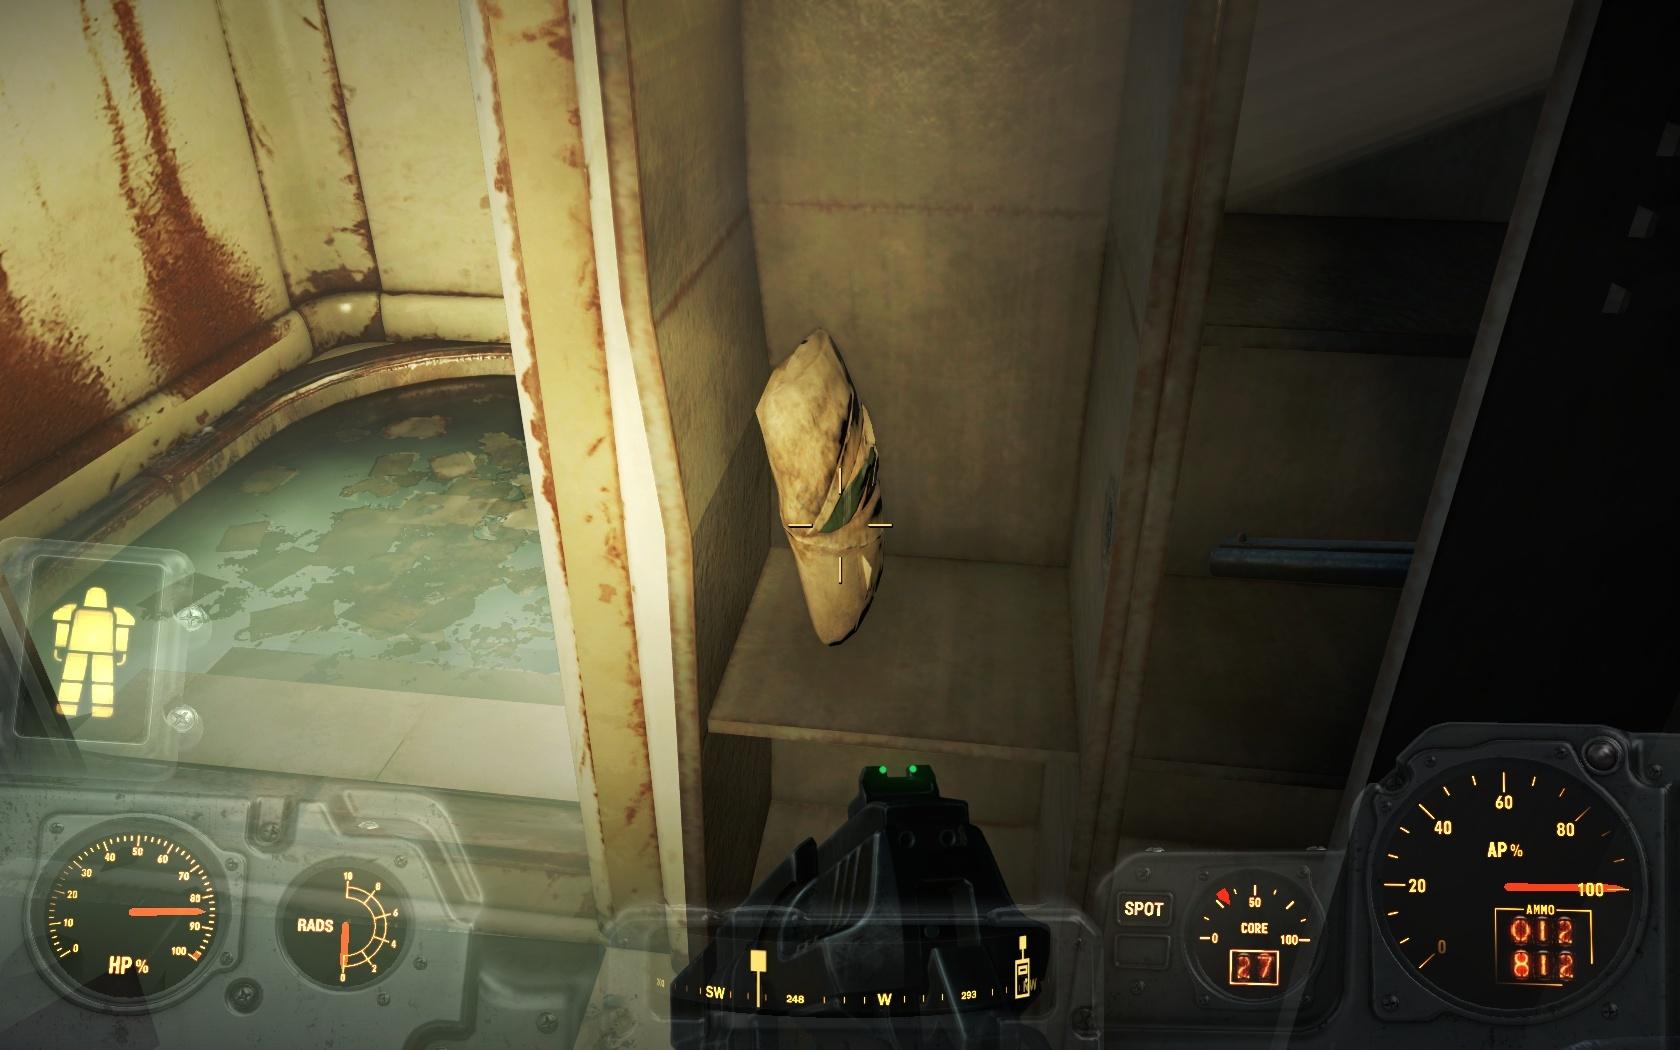 Недоступный костюм (Корпорация ГаллюциГен) - Fallout 4 Баг, Галлюциген, Корпорация, Недоступный